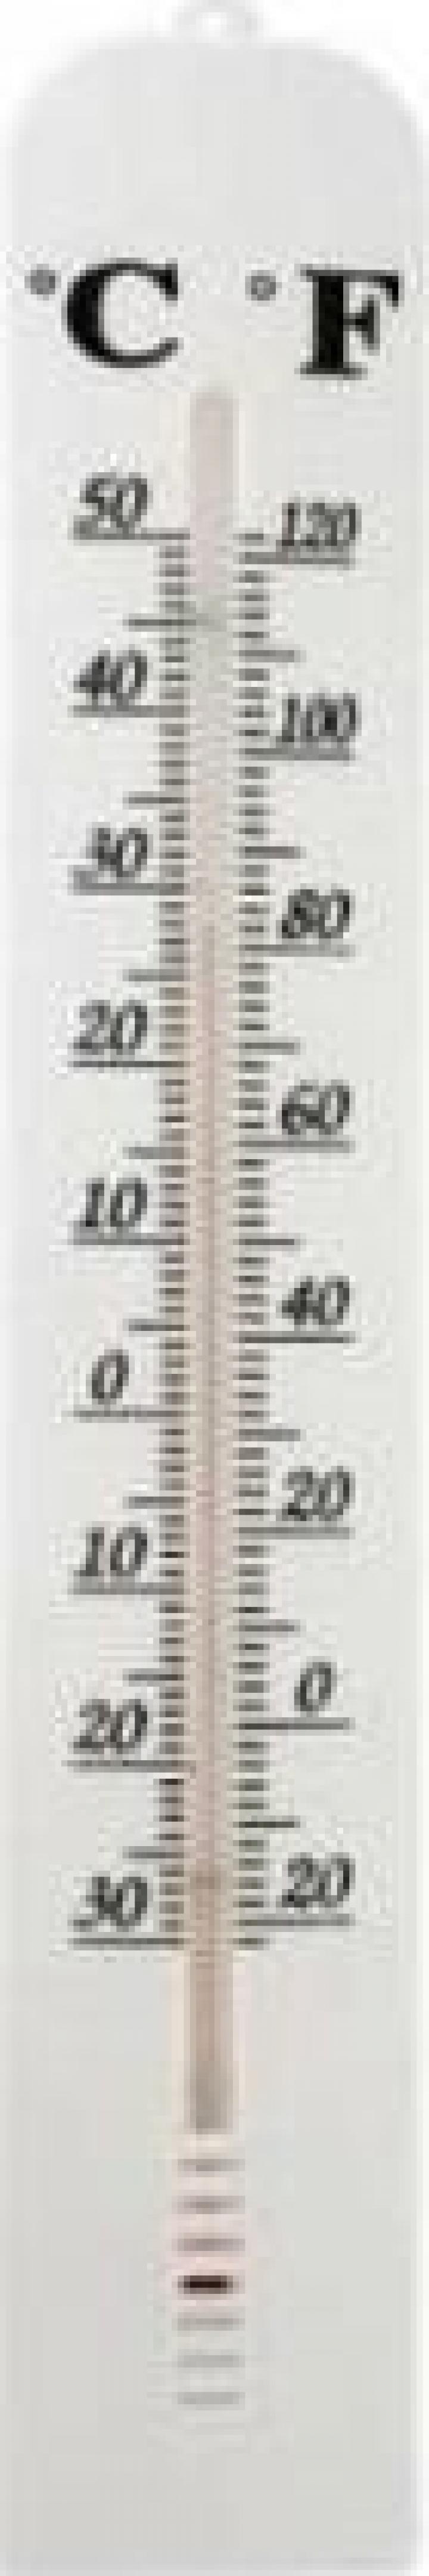 Termometru plastic de perete, Strend Pro TMS-073, 400 mm